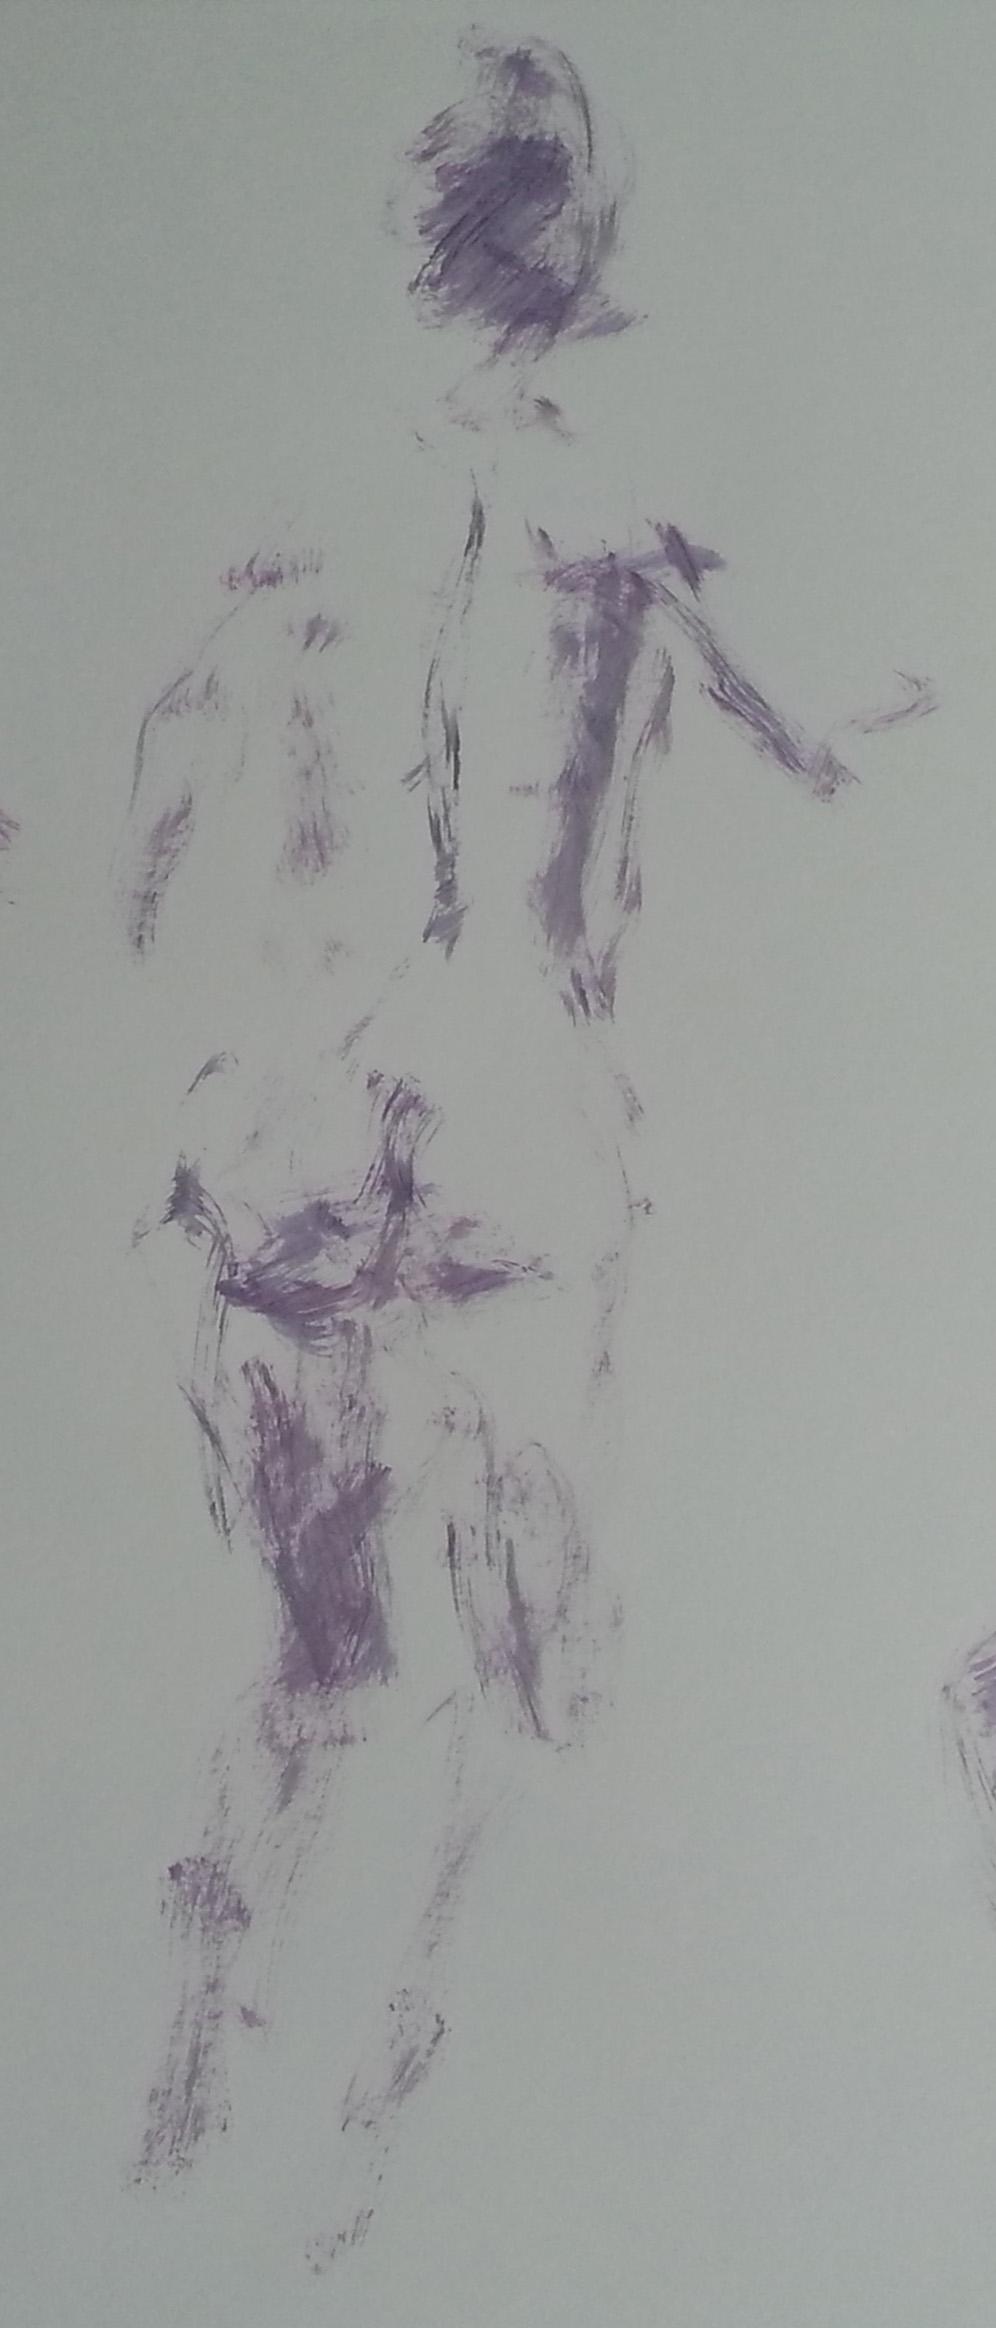 Emmanuelle 30–03-2017 Acrylique - olivierjouanard | ello